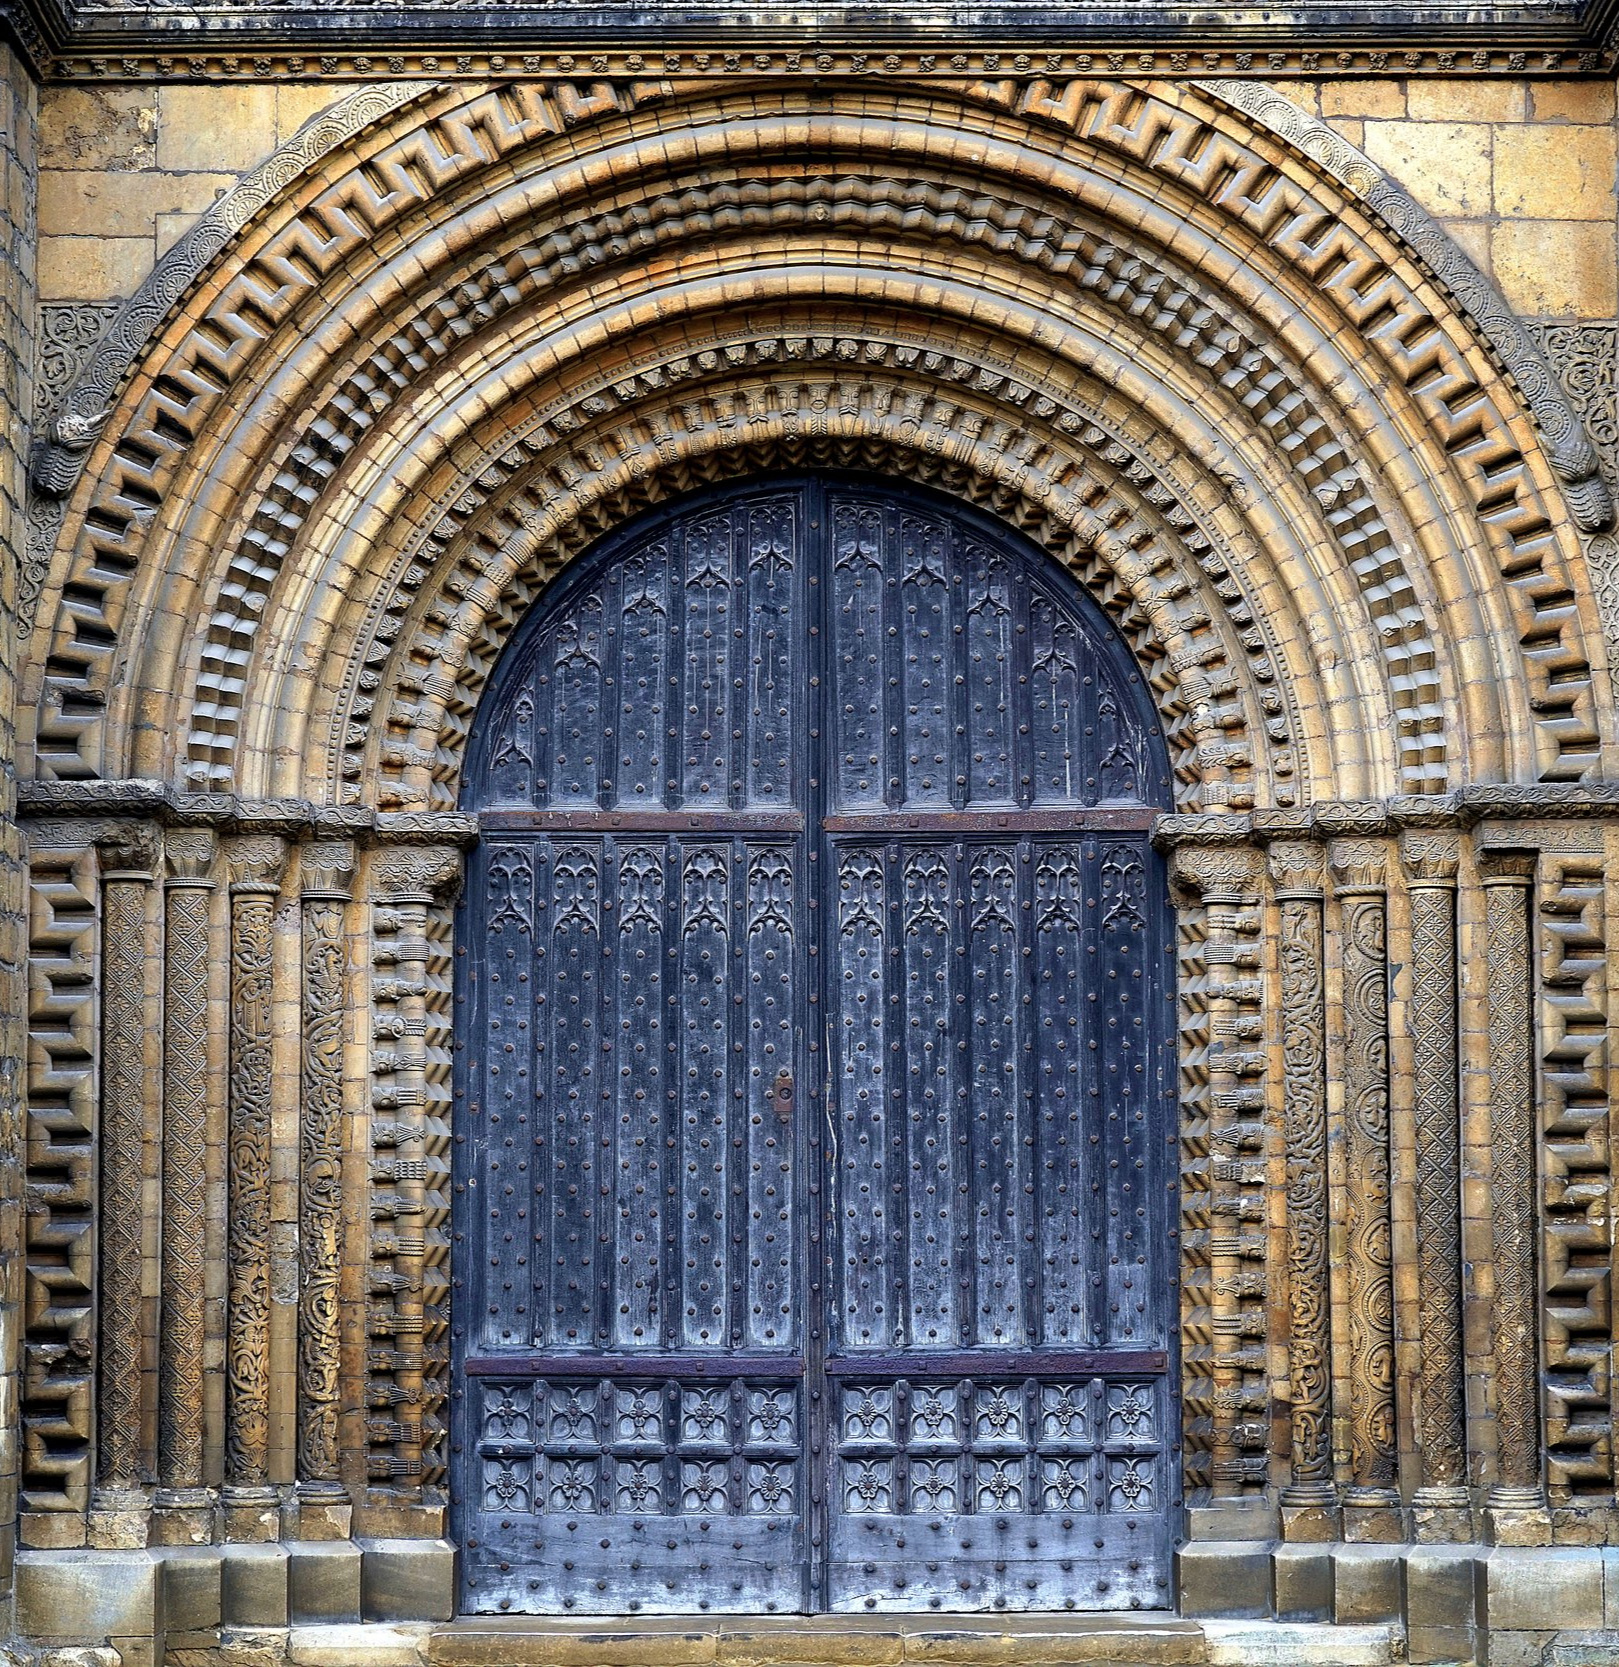 ancient-arch-architectural-design-351086 (1).jpg